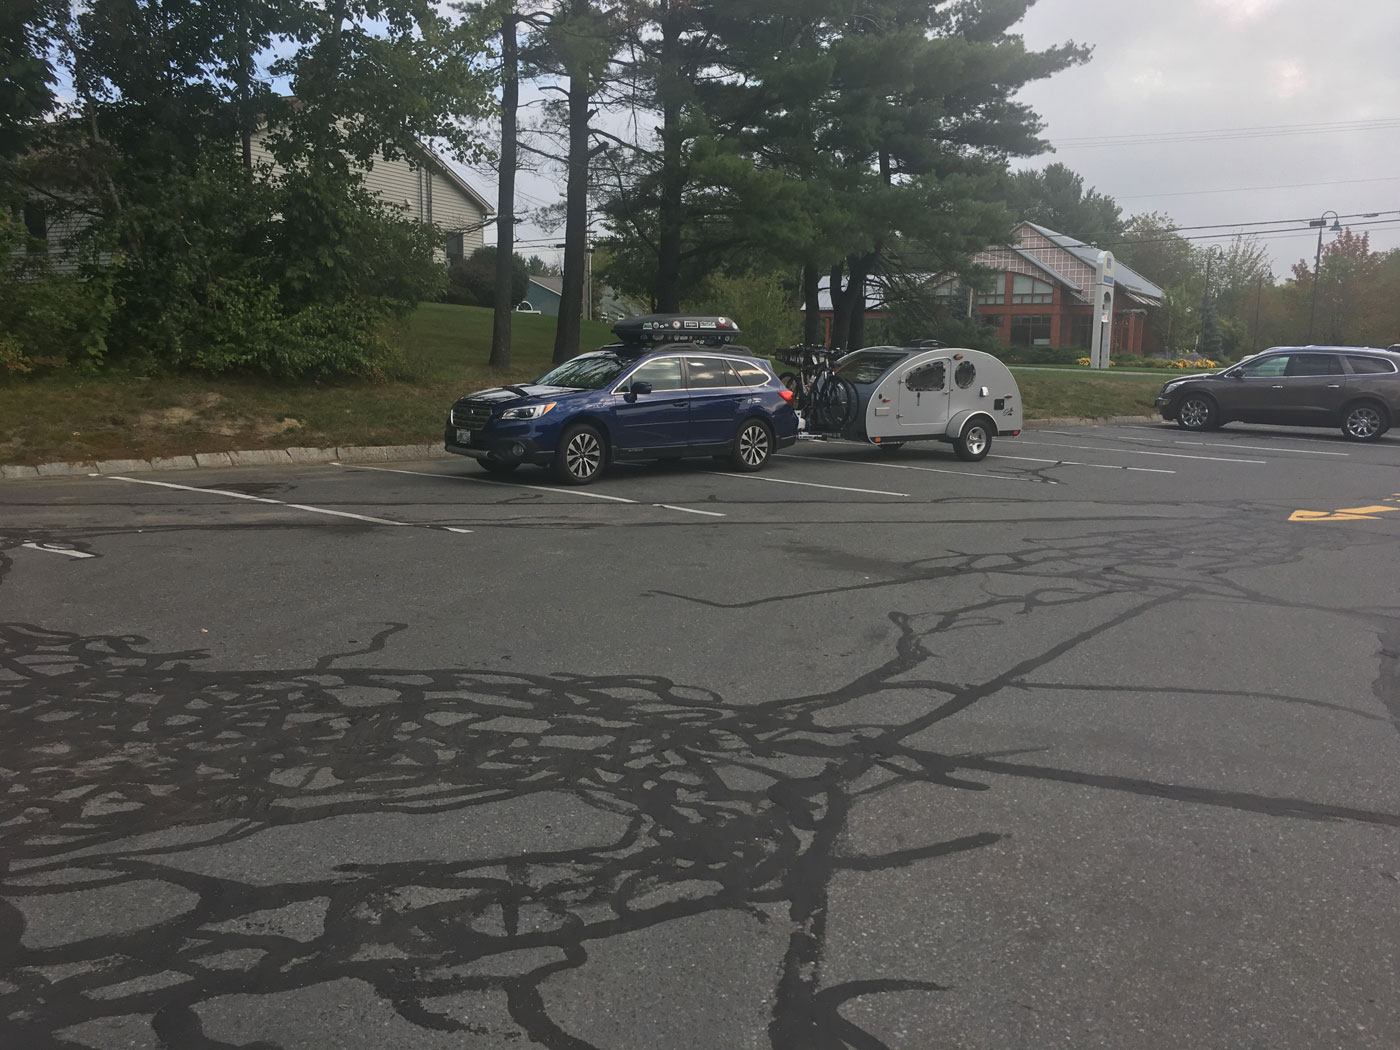 A roadside stop in Maine